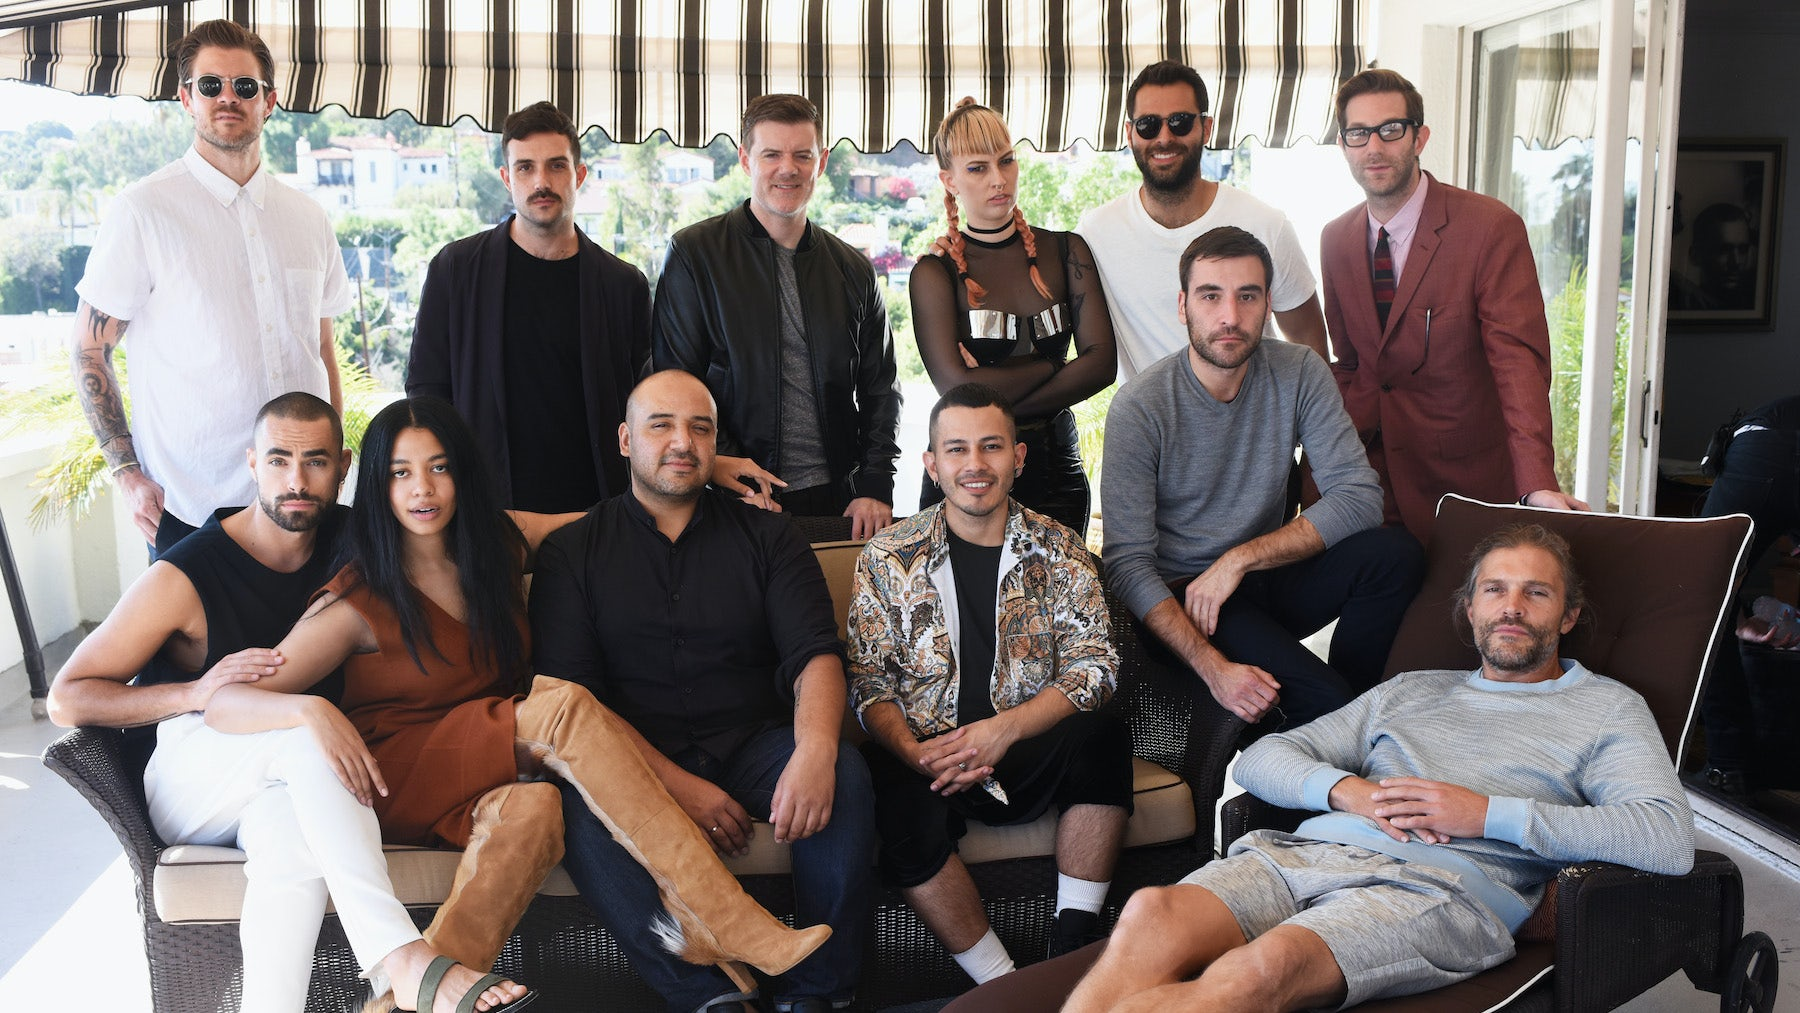 CFDA/Vogue Fashion Fund Finalists | Photo by Jeff Vespa/Getty